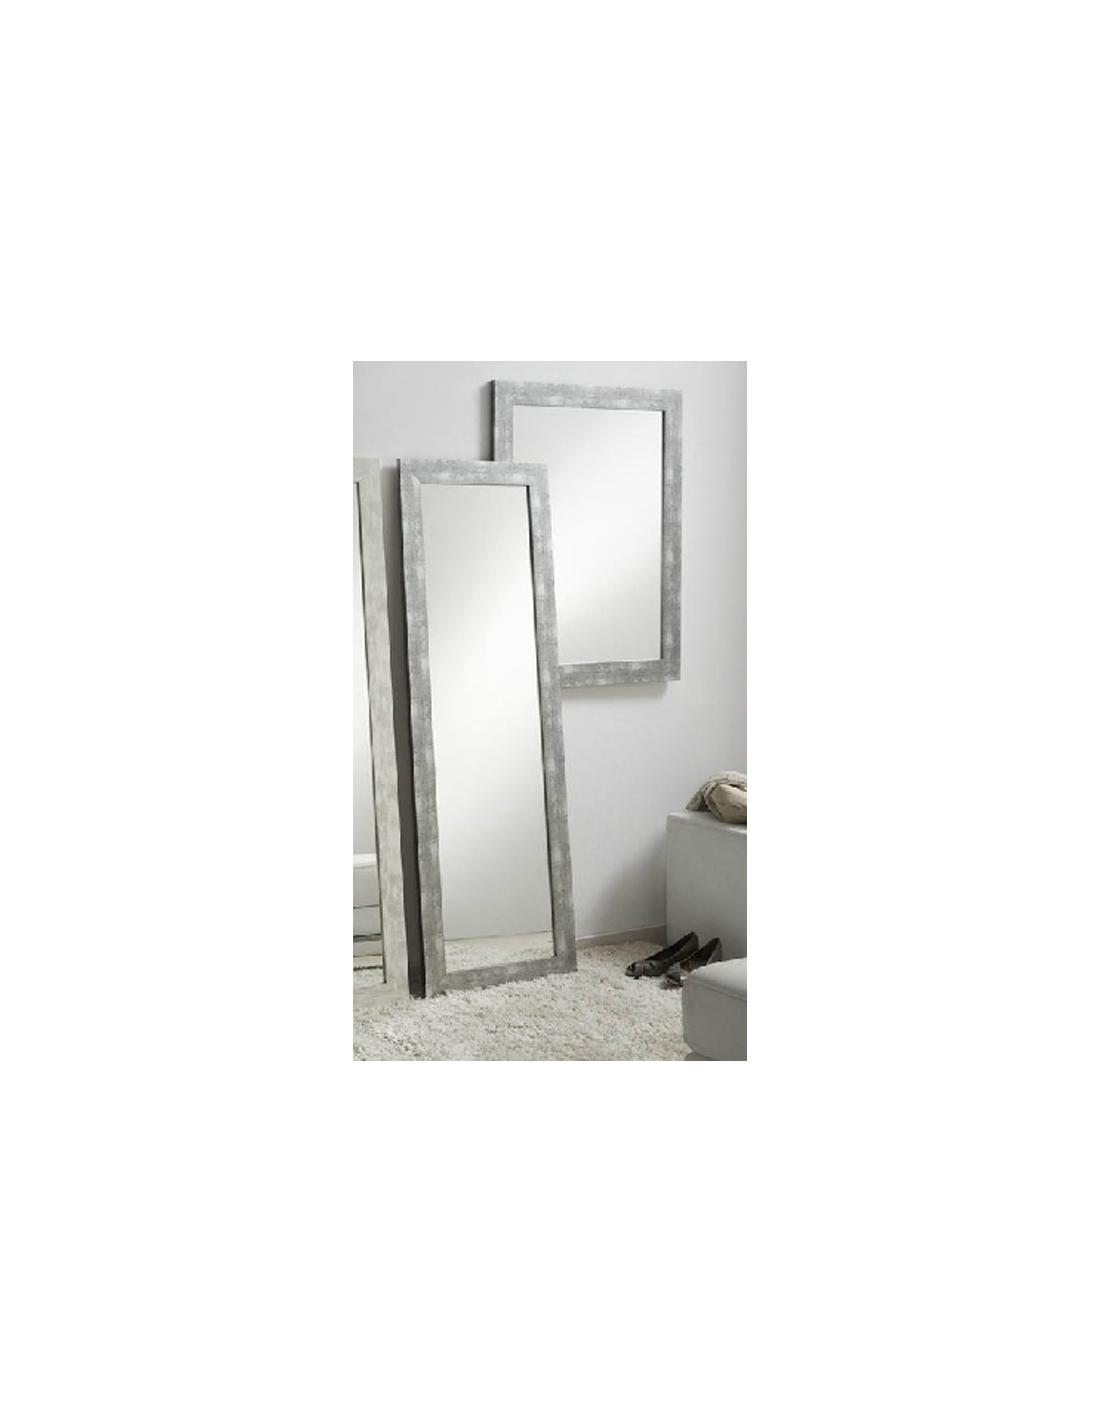 Comprar espejo decorativo madera decapado gris dos medidas for Espejos decorativos blancos